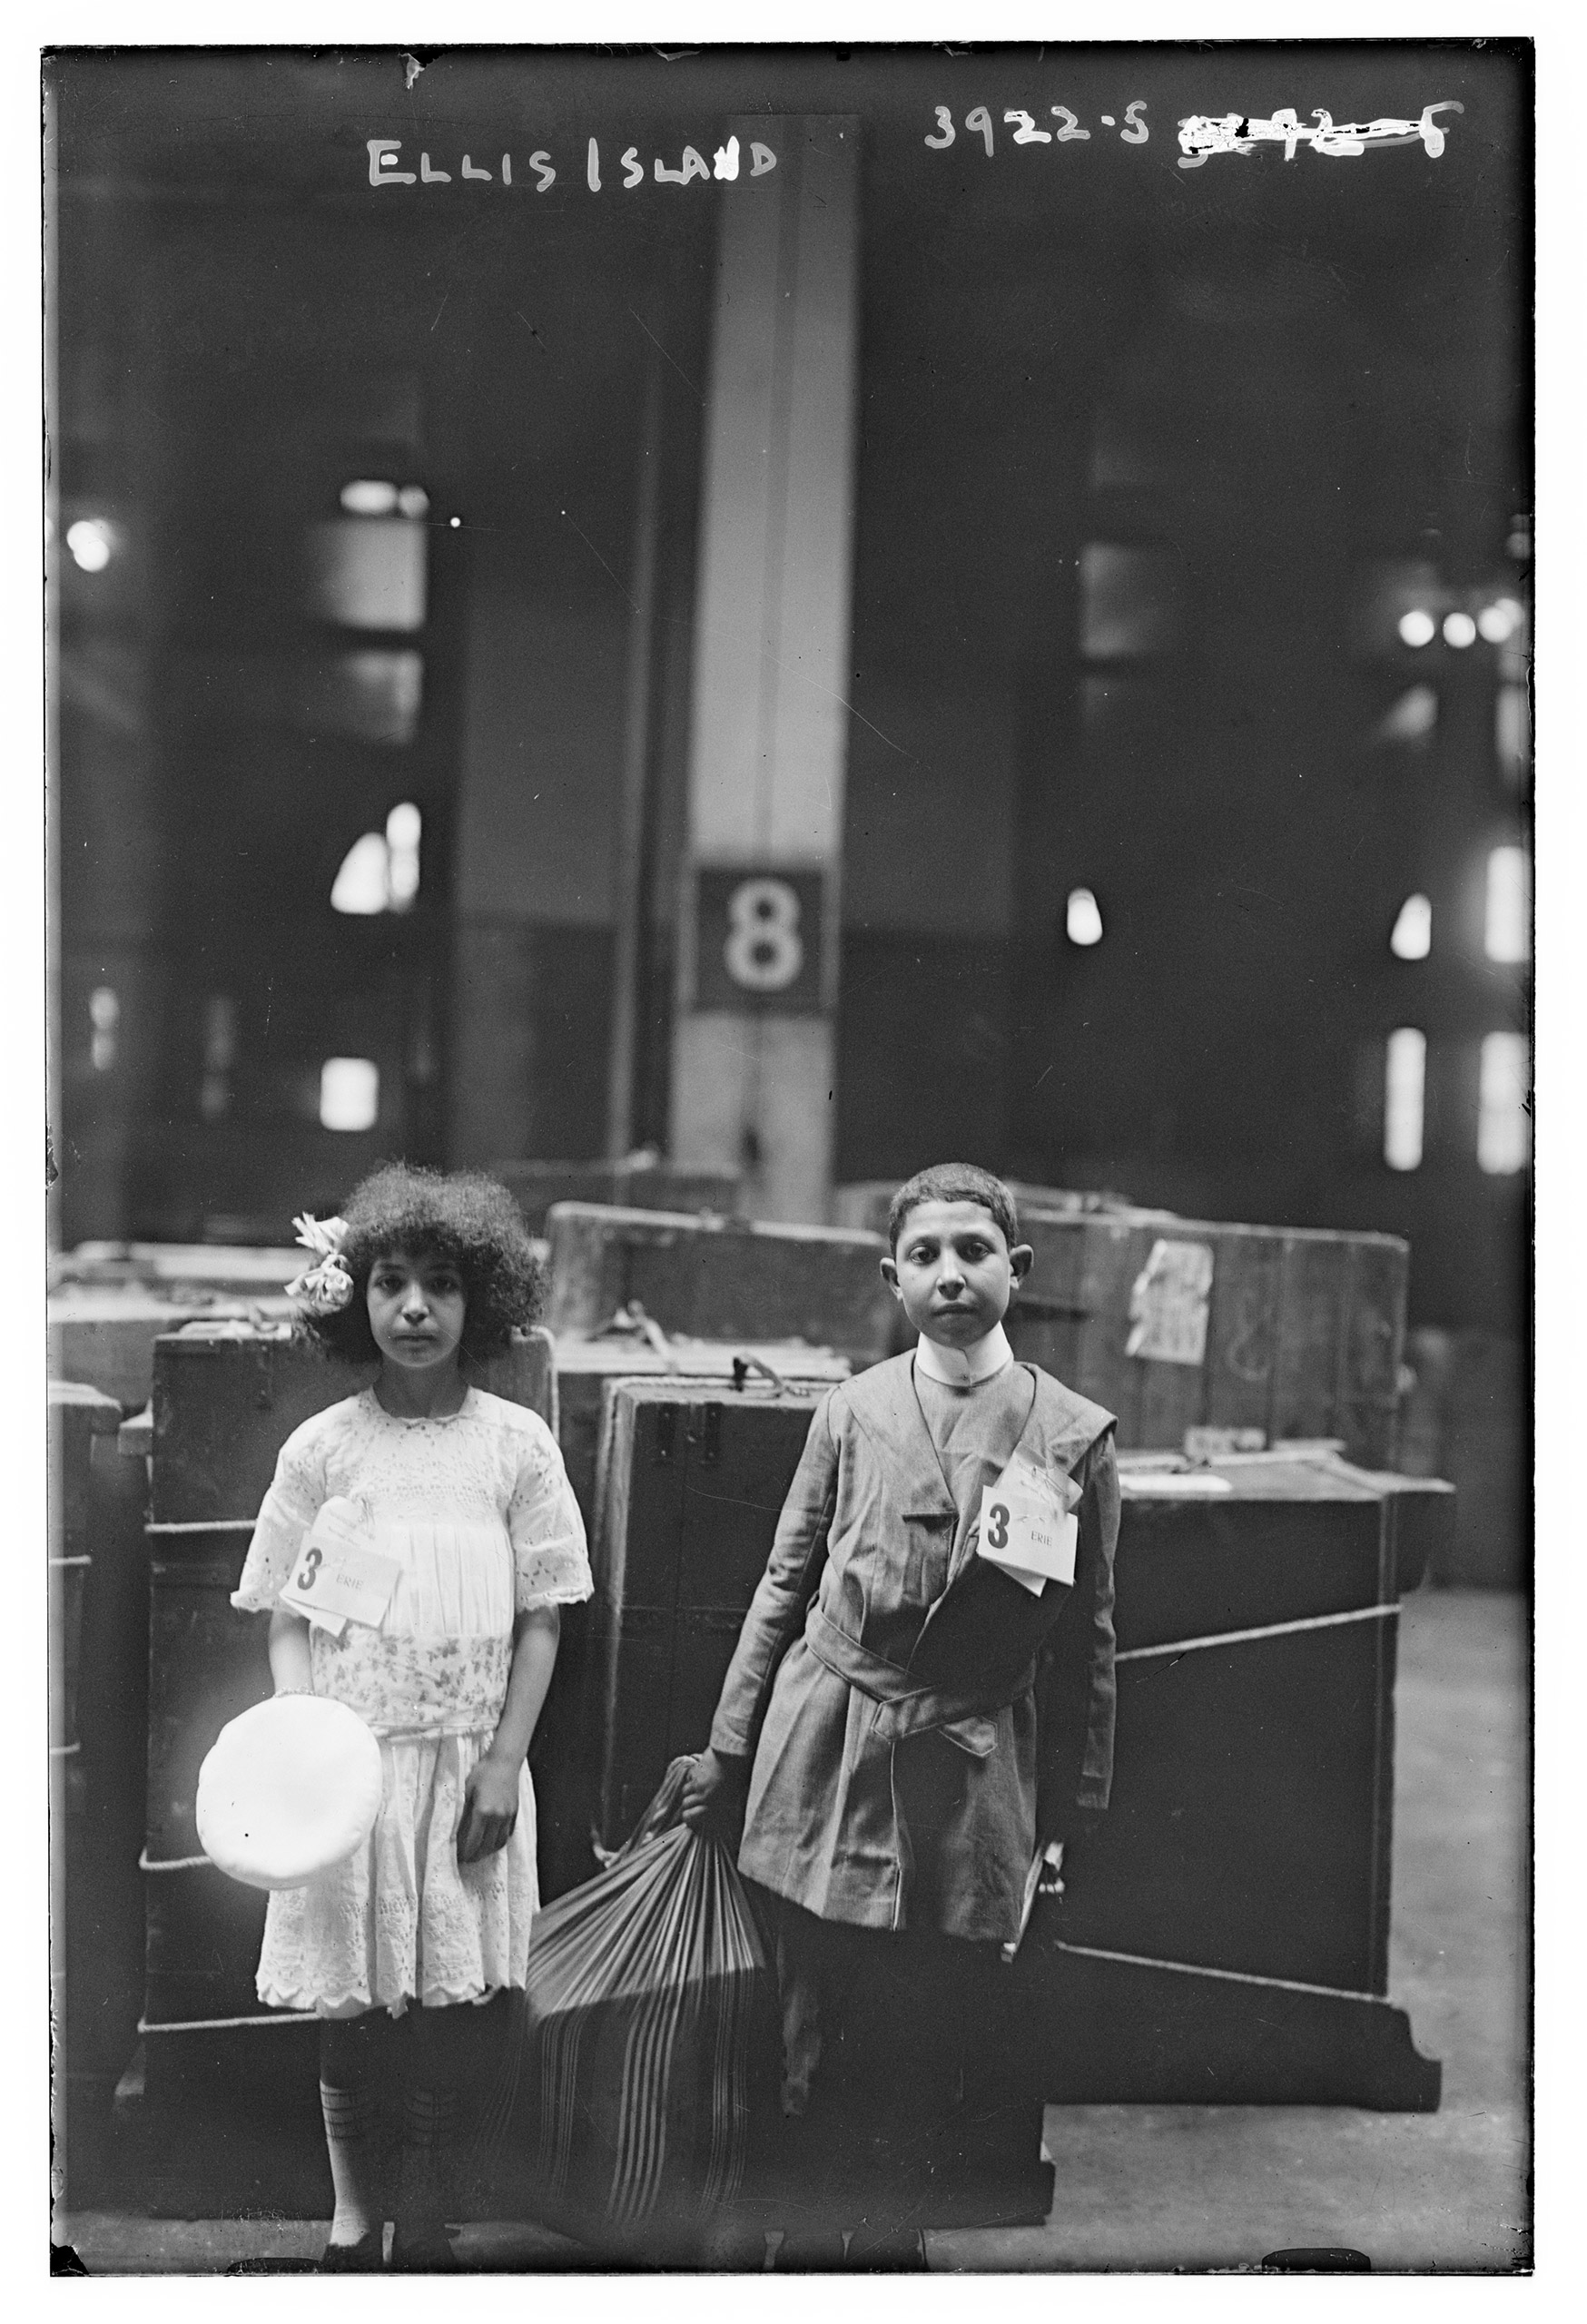 Ellis Island, cica 1915.